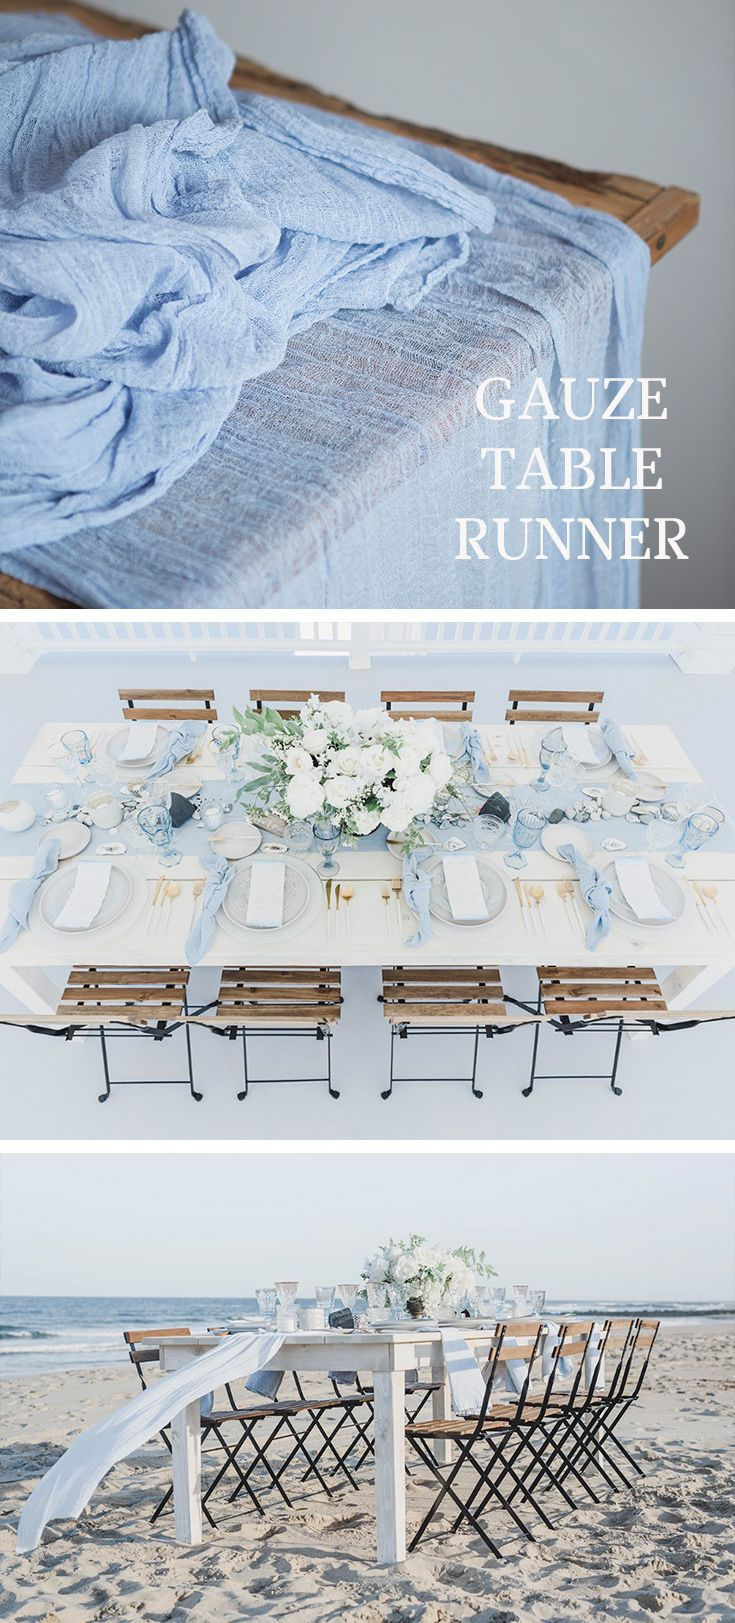 Gauze Table Runner Rustic Wedding Centerpiece Cheesecloth Table Runner Boho Wedding Gauz Rustic Chic Wedding Rustic Wedding Centerpieces Rustic Country Wedding